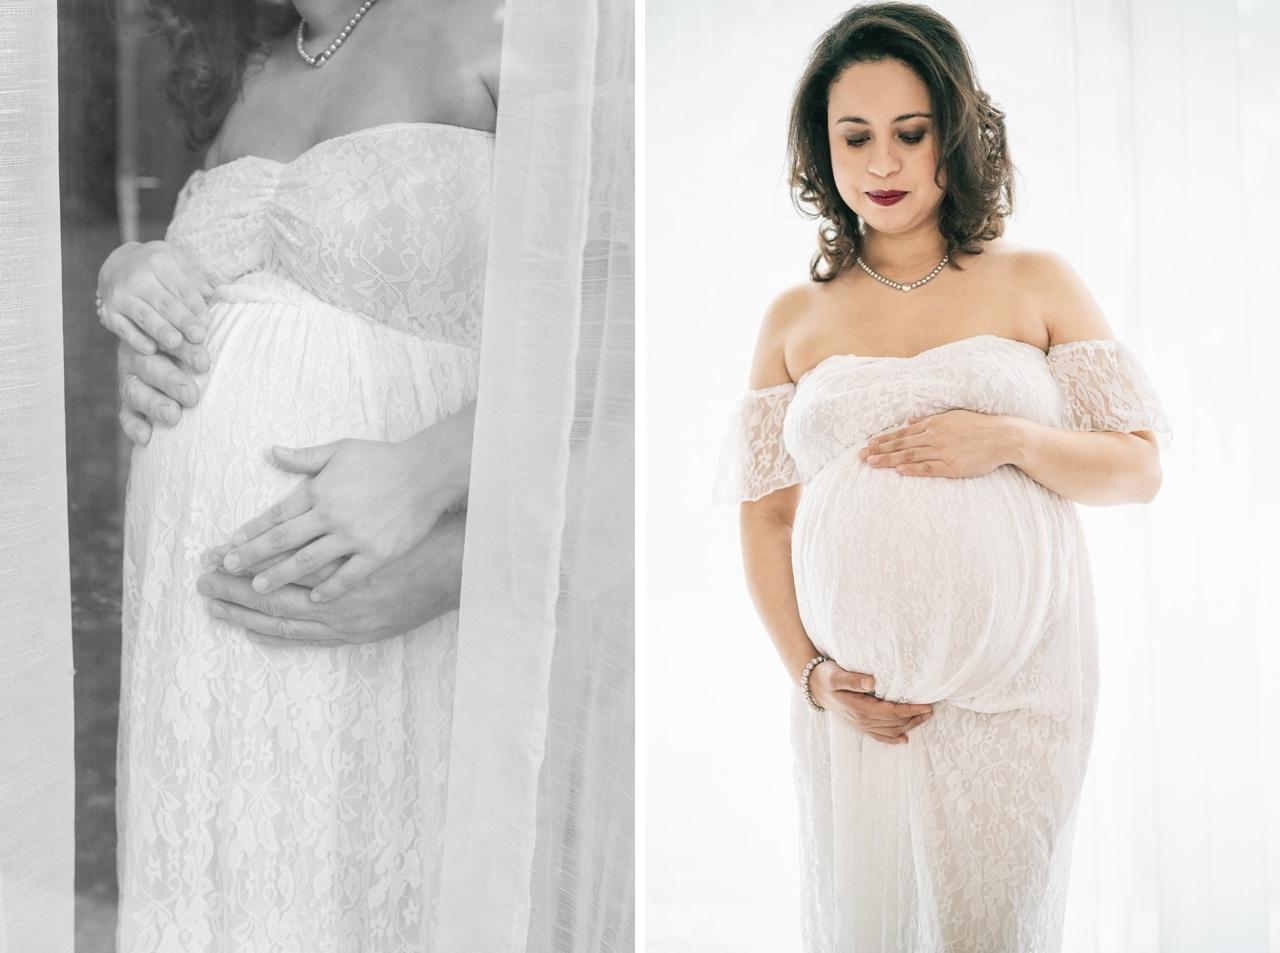 seance-grossesse-mons-belgique-3